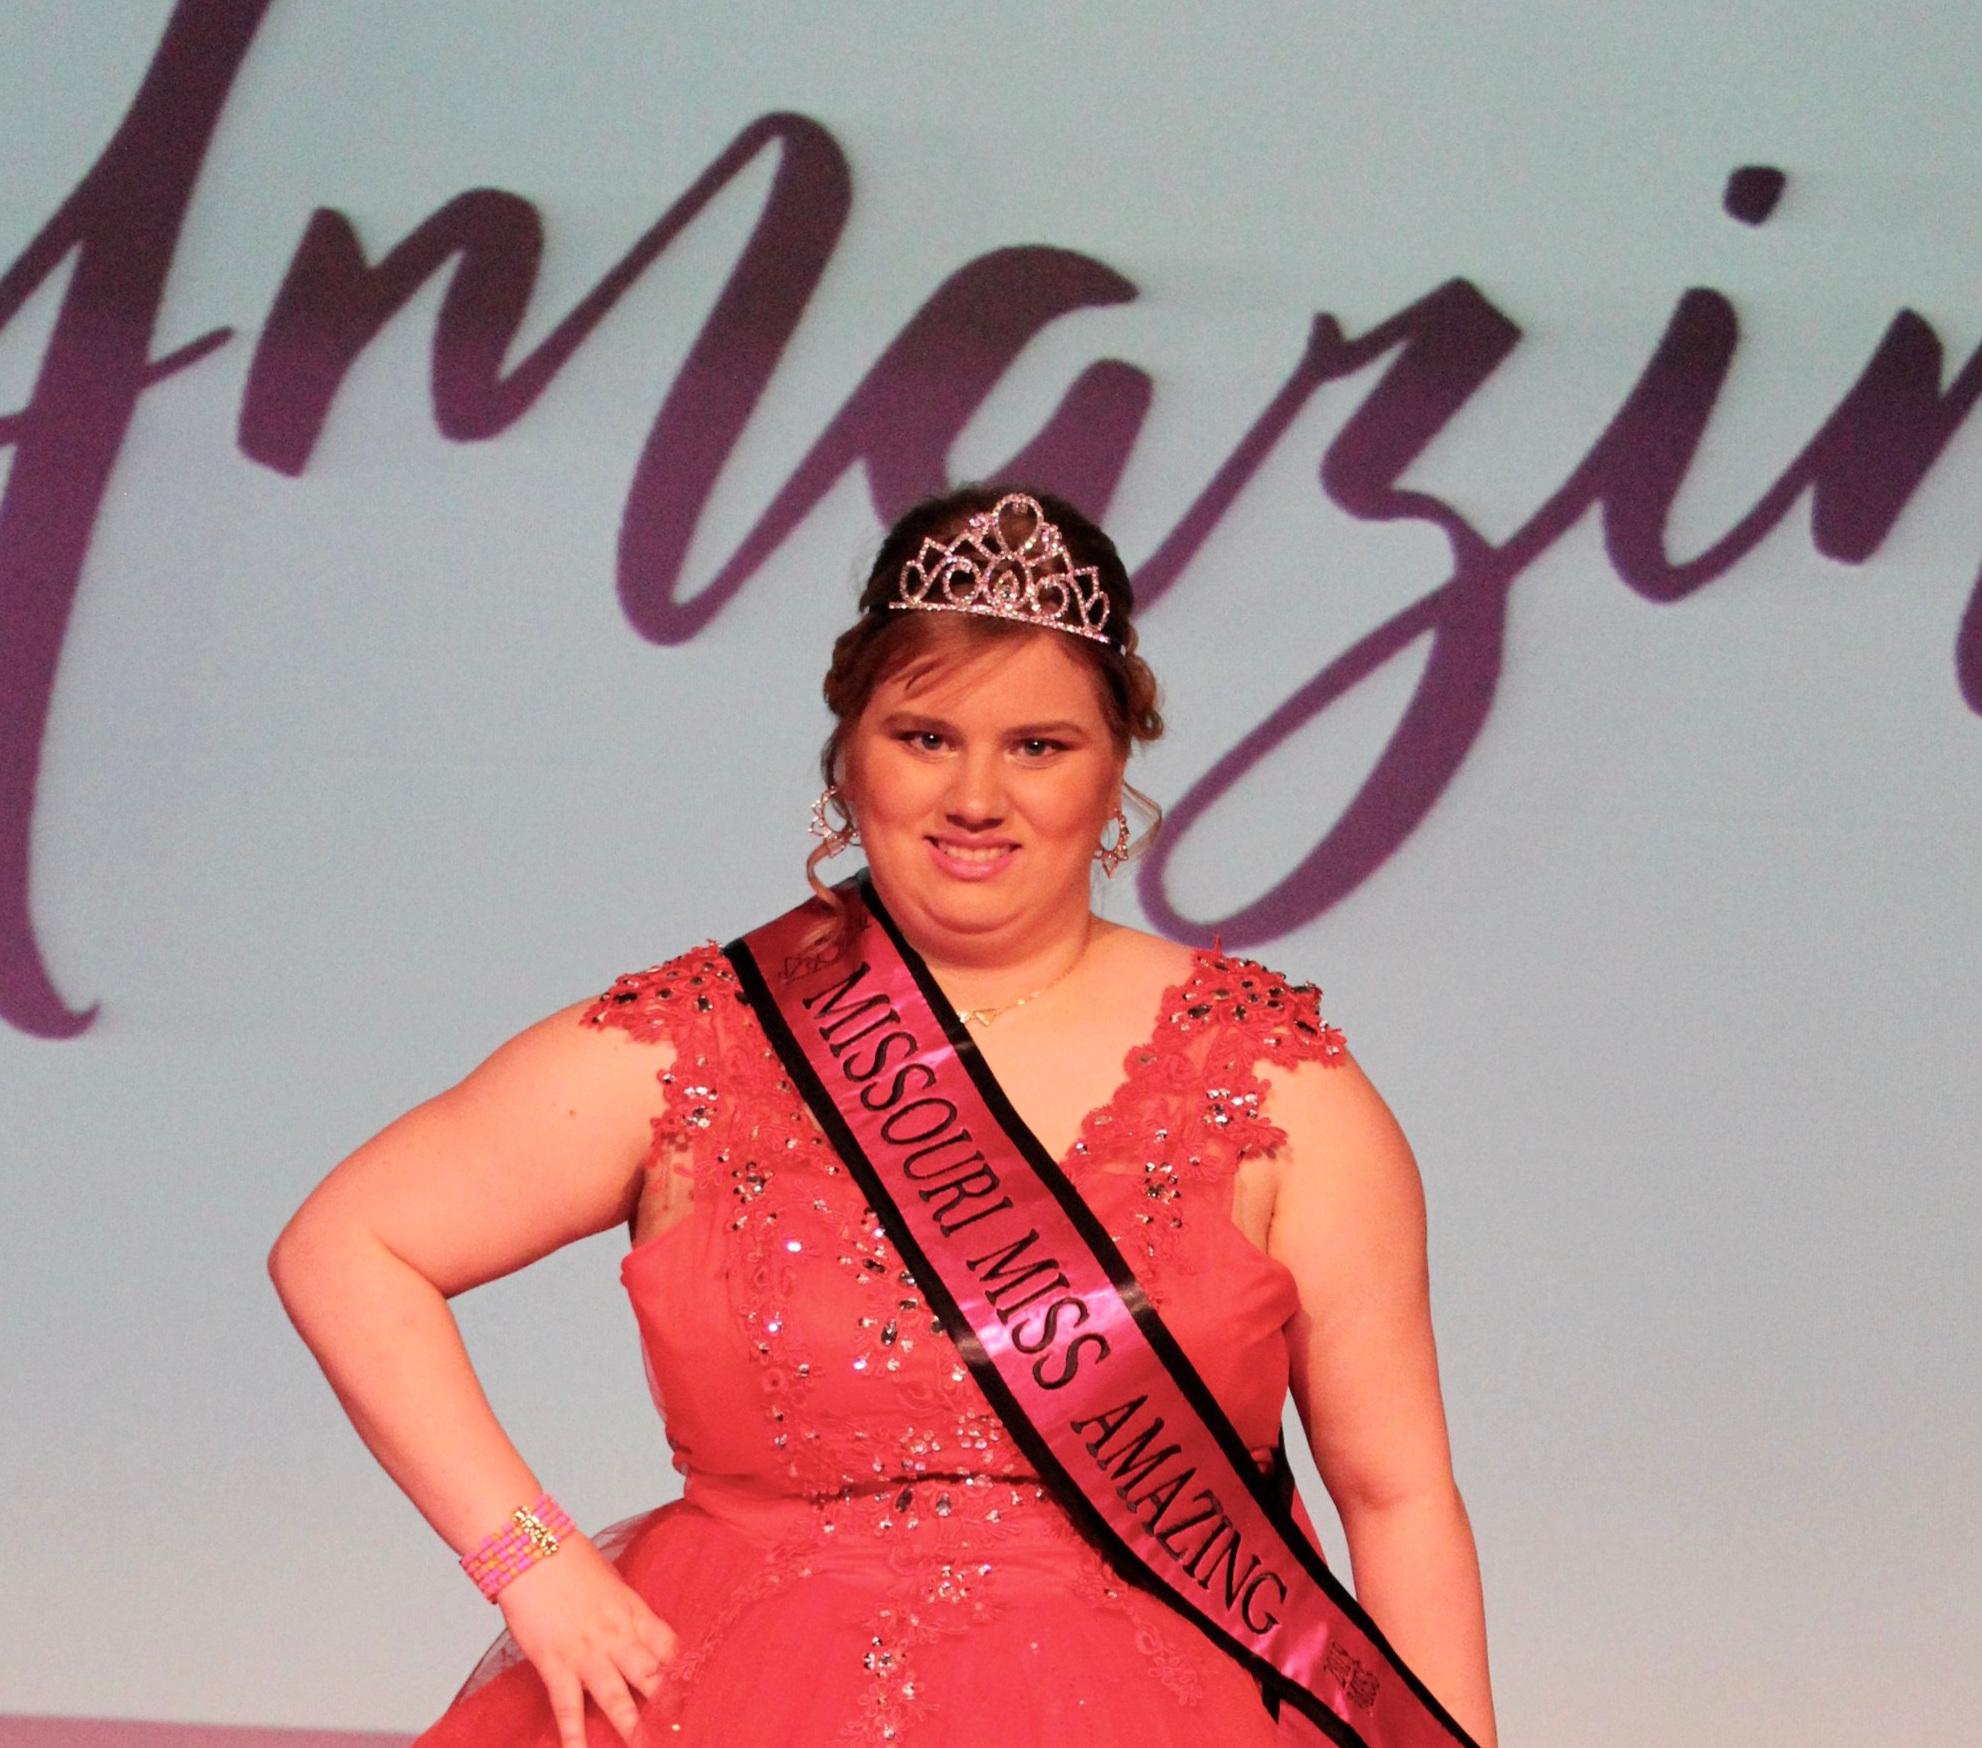 Missouri Miss Amazing Miss  |  Sophia Annunziato   Click to read more about Sophia!